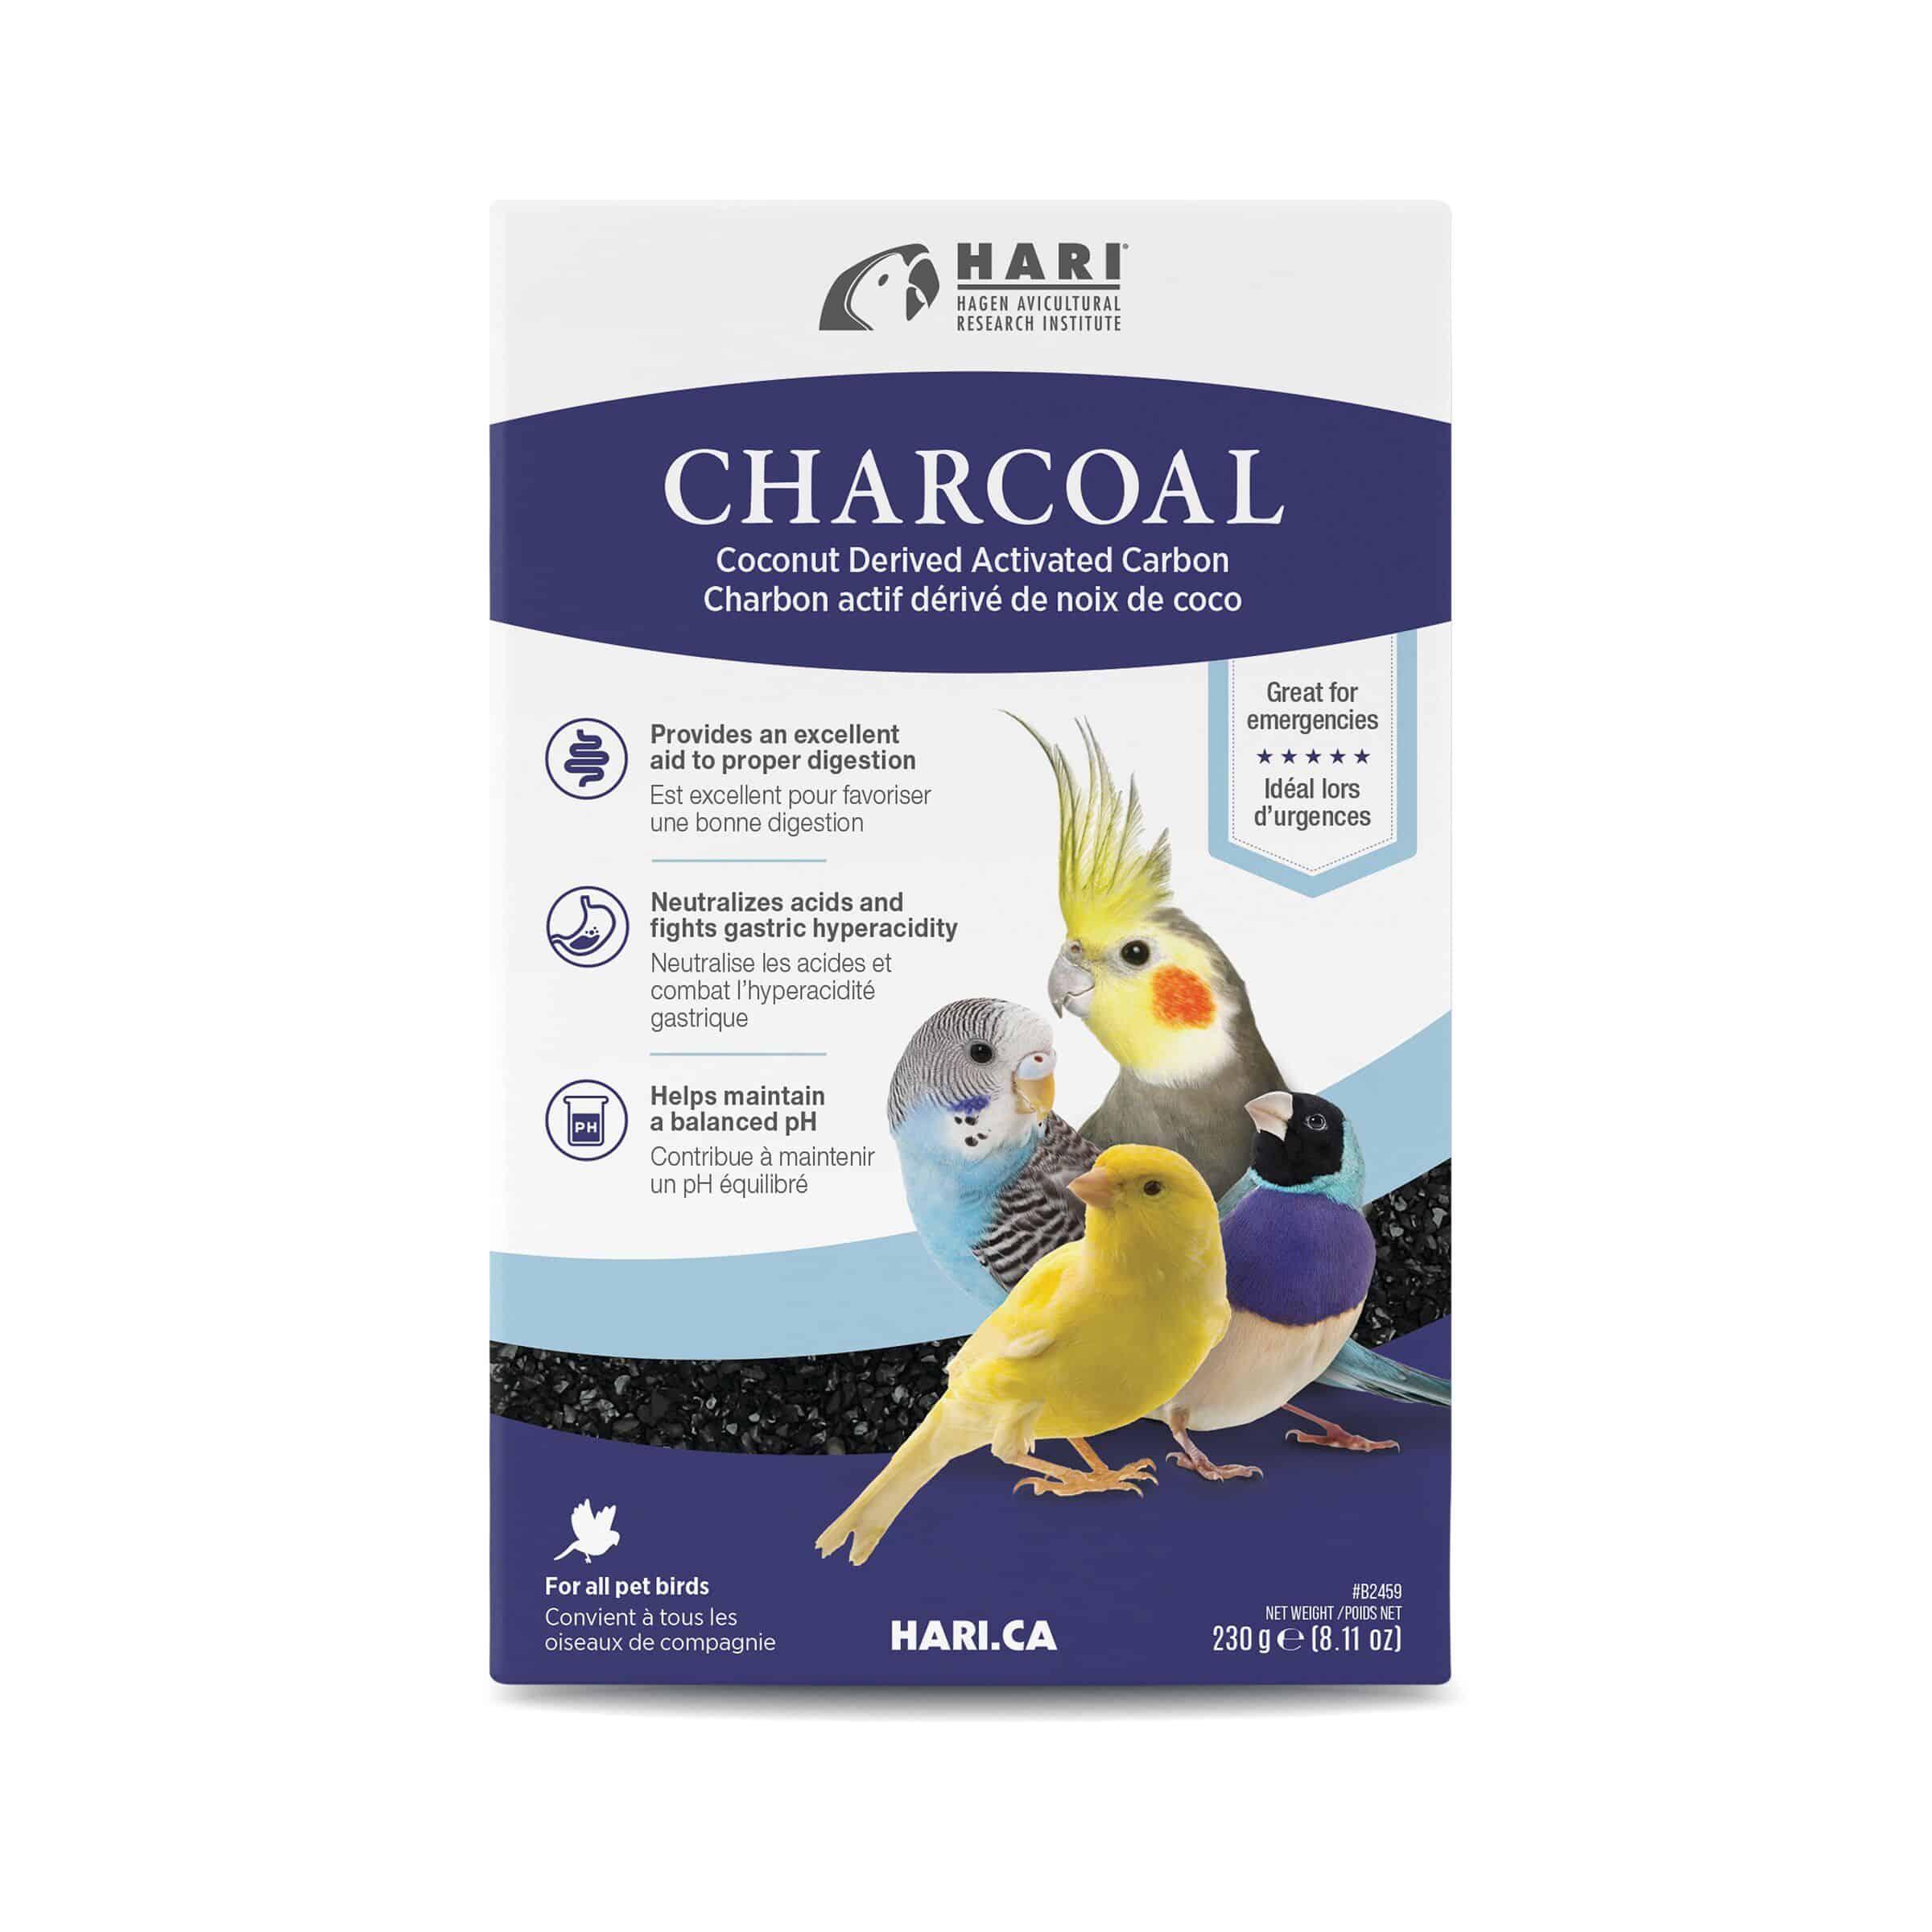 Bird Charcoal Supplement by Hagen Hari 8.11oz (230g) Box